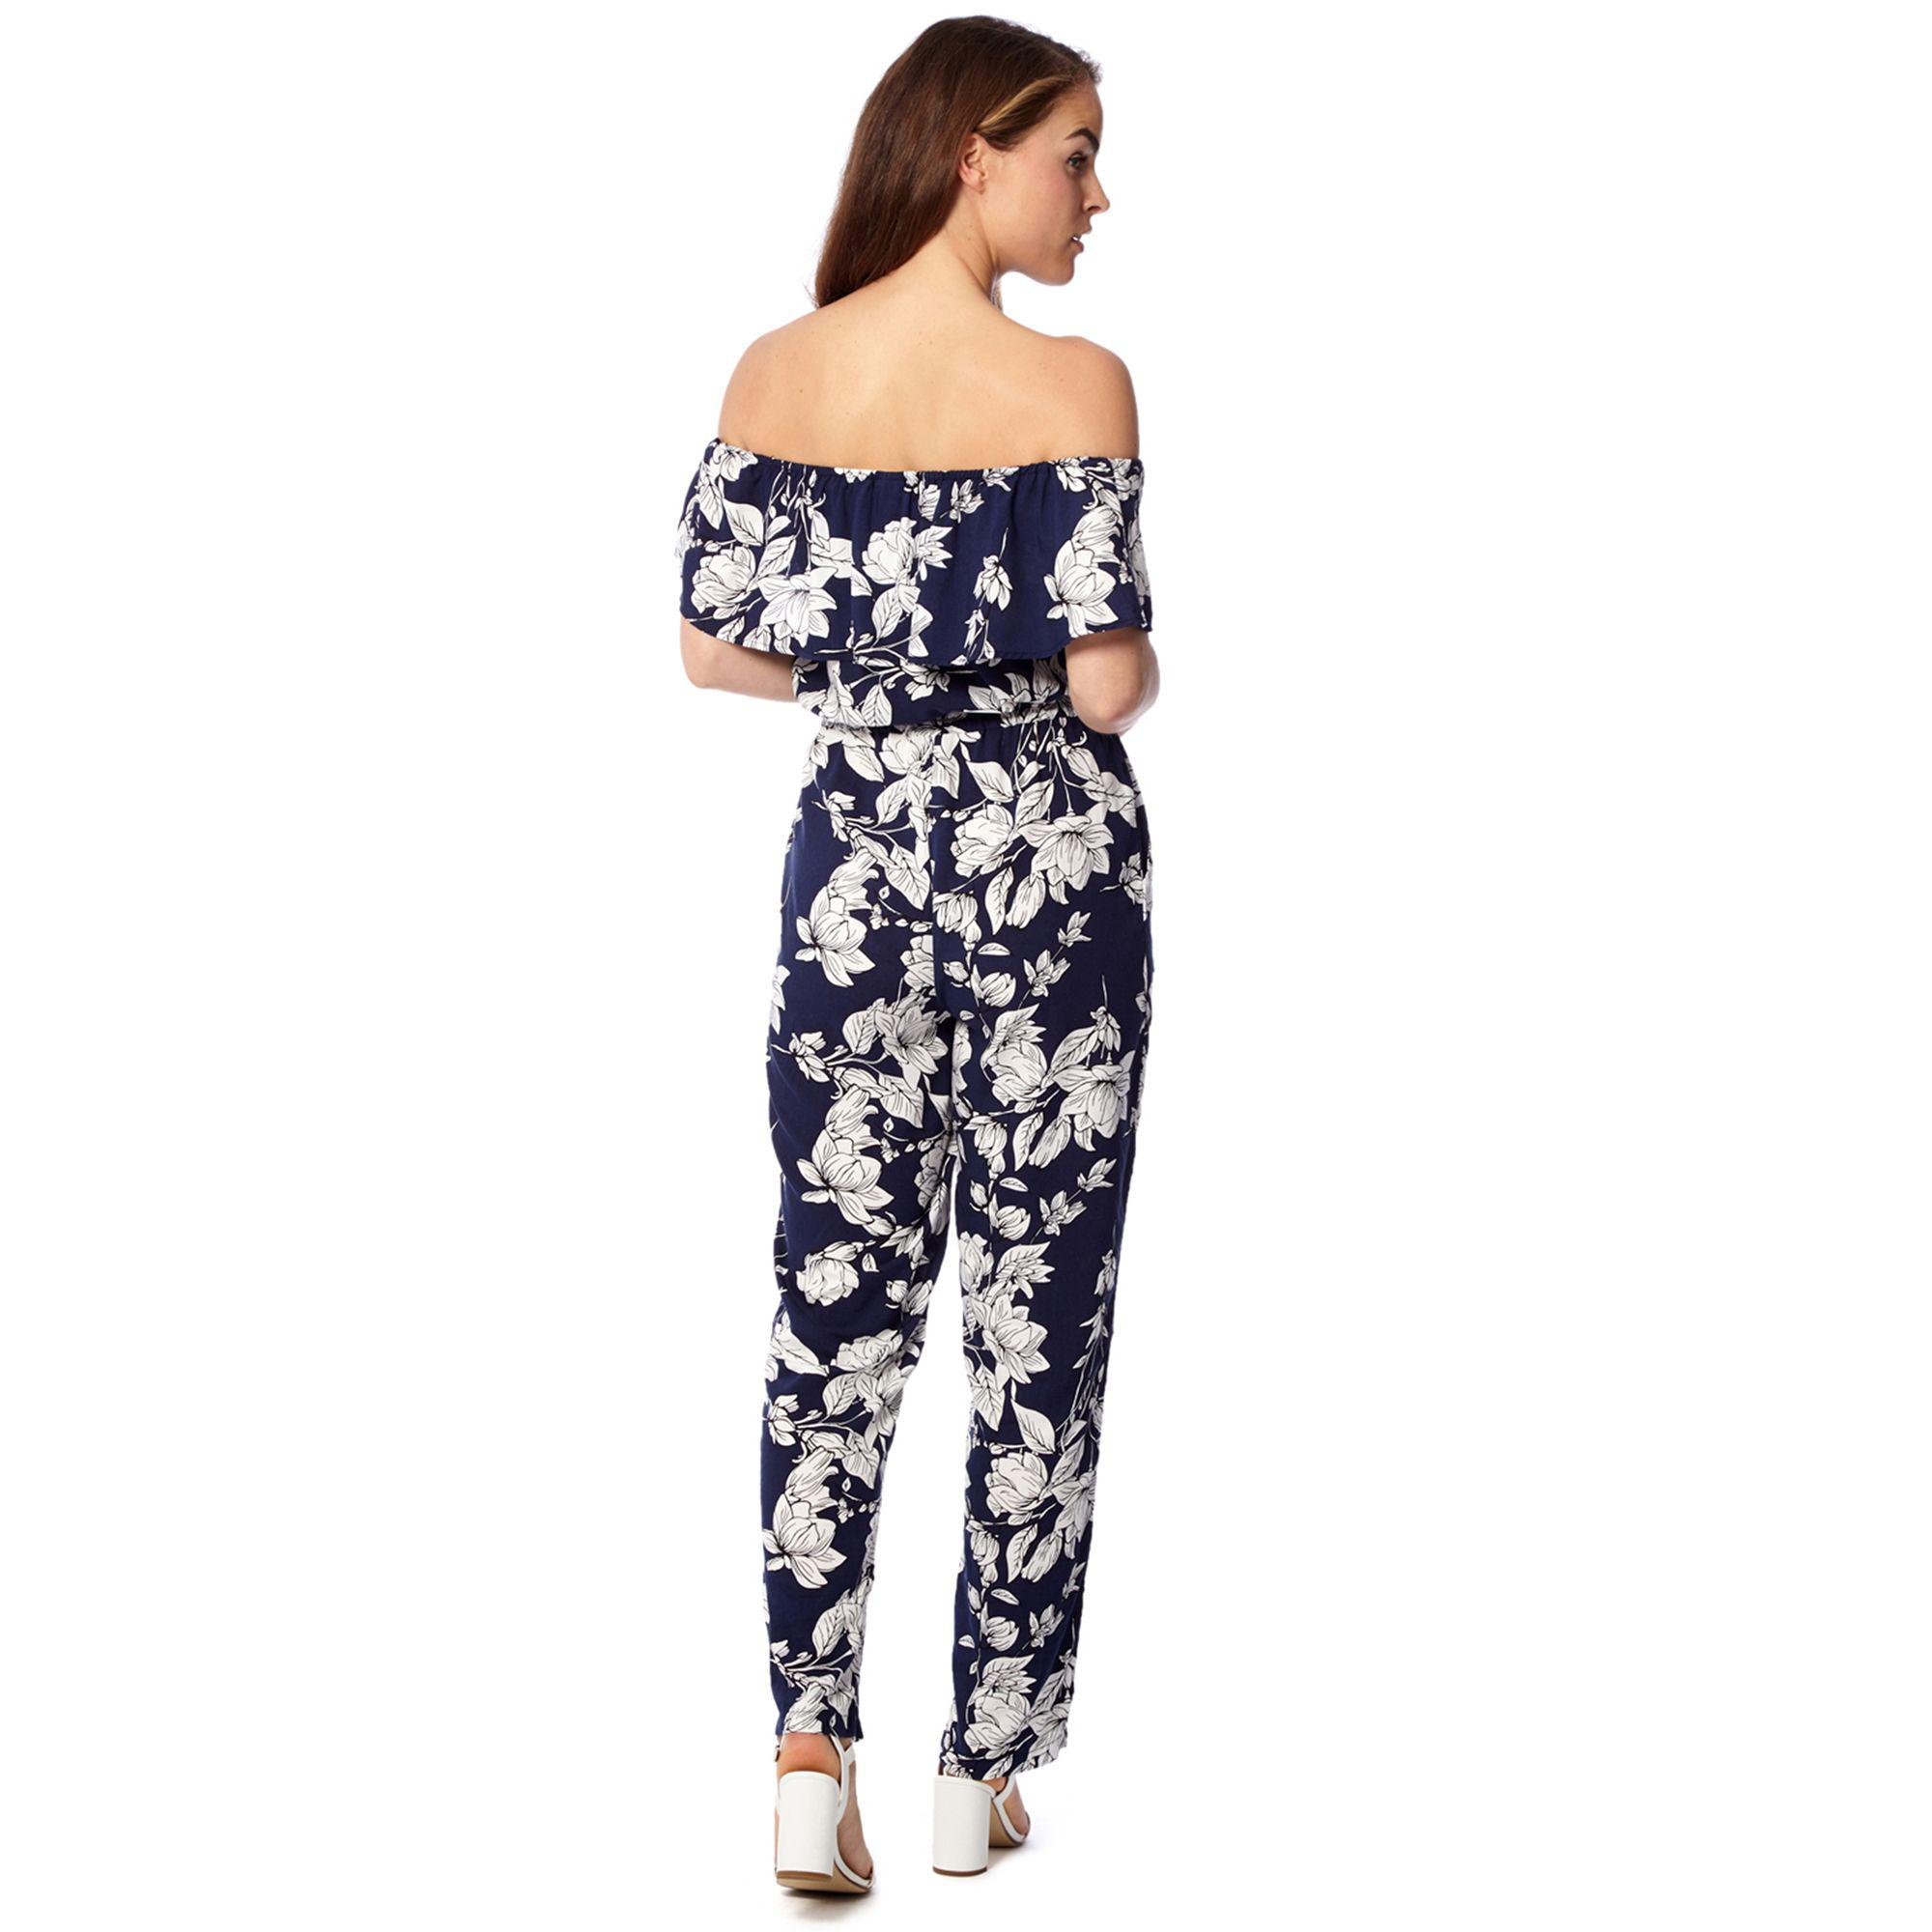 baa32094ea9b Izabel London Navy Floral Print Bardot Jumpsuit in Blue - Lyst